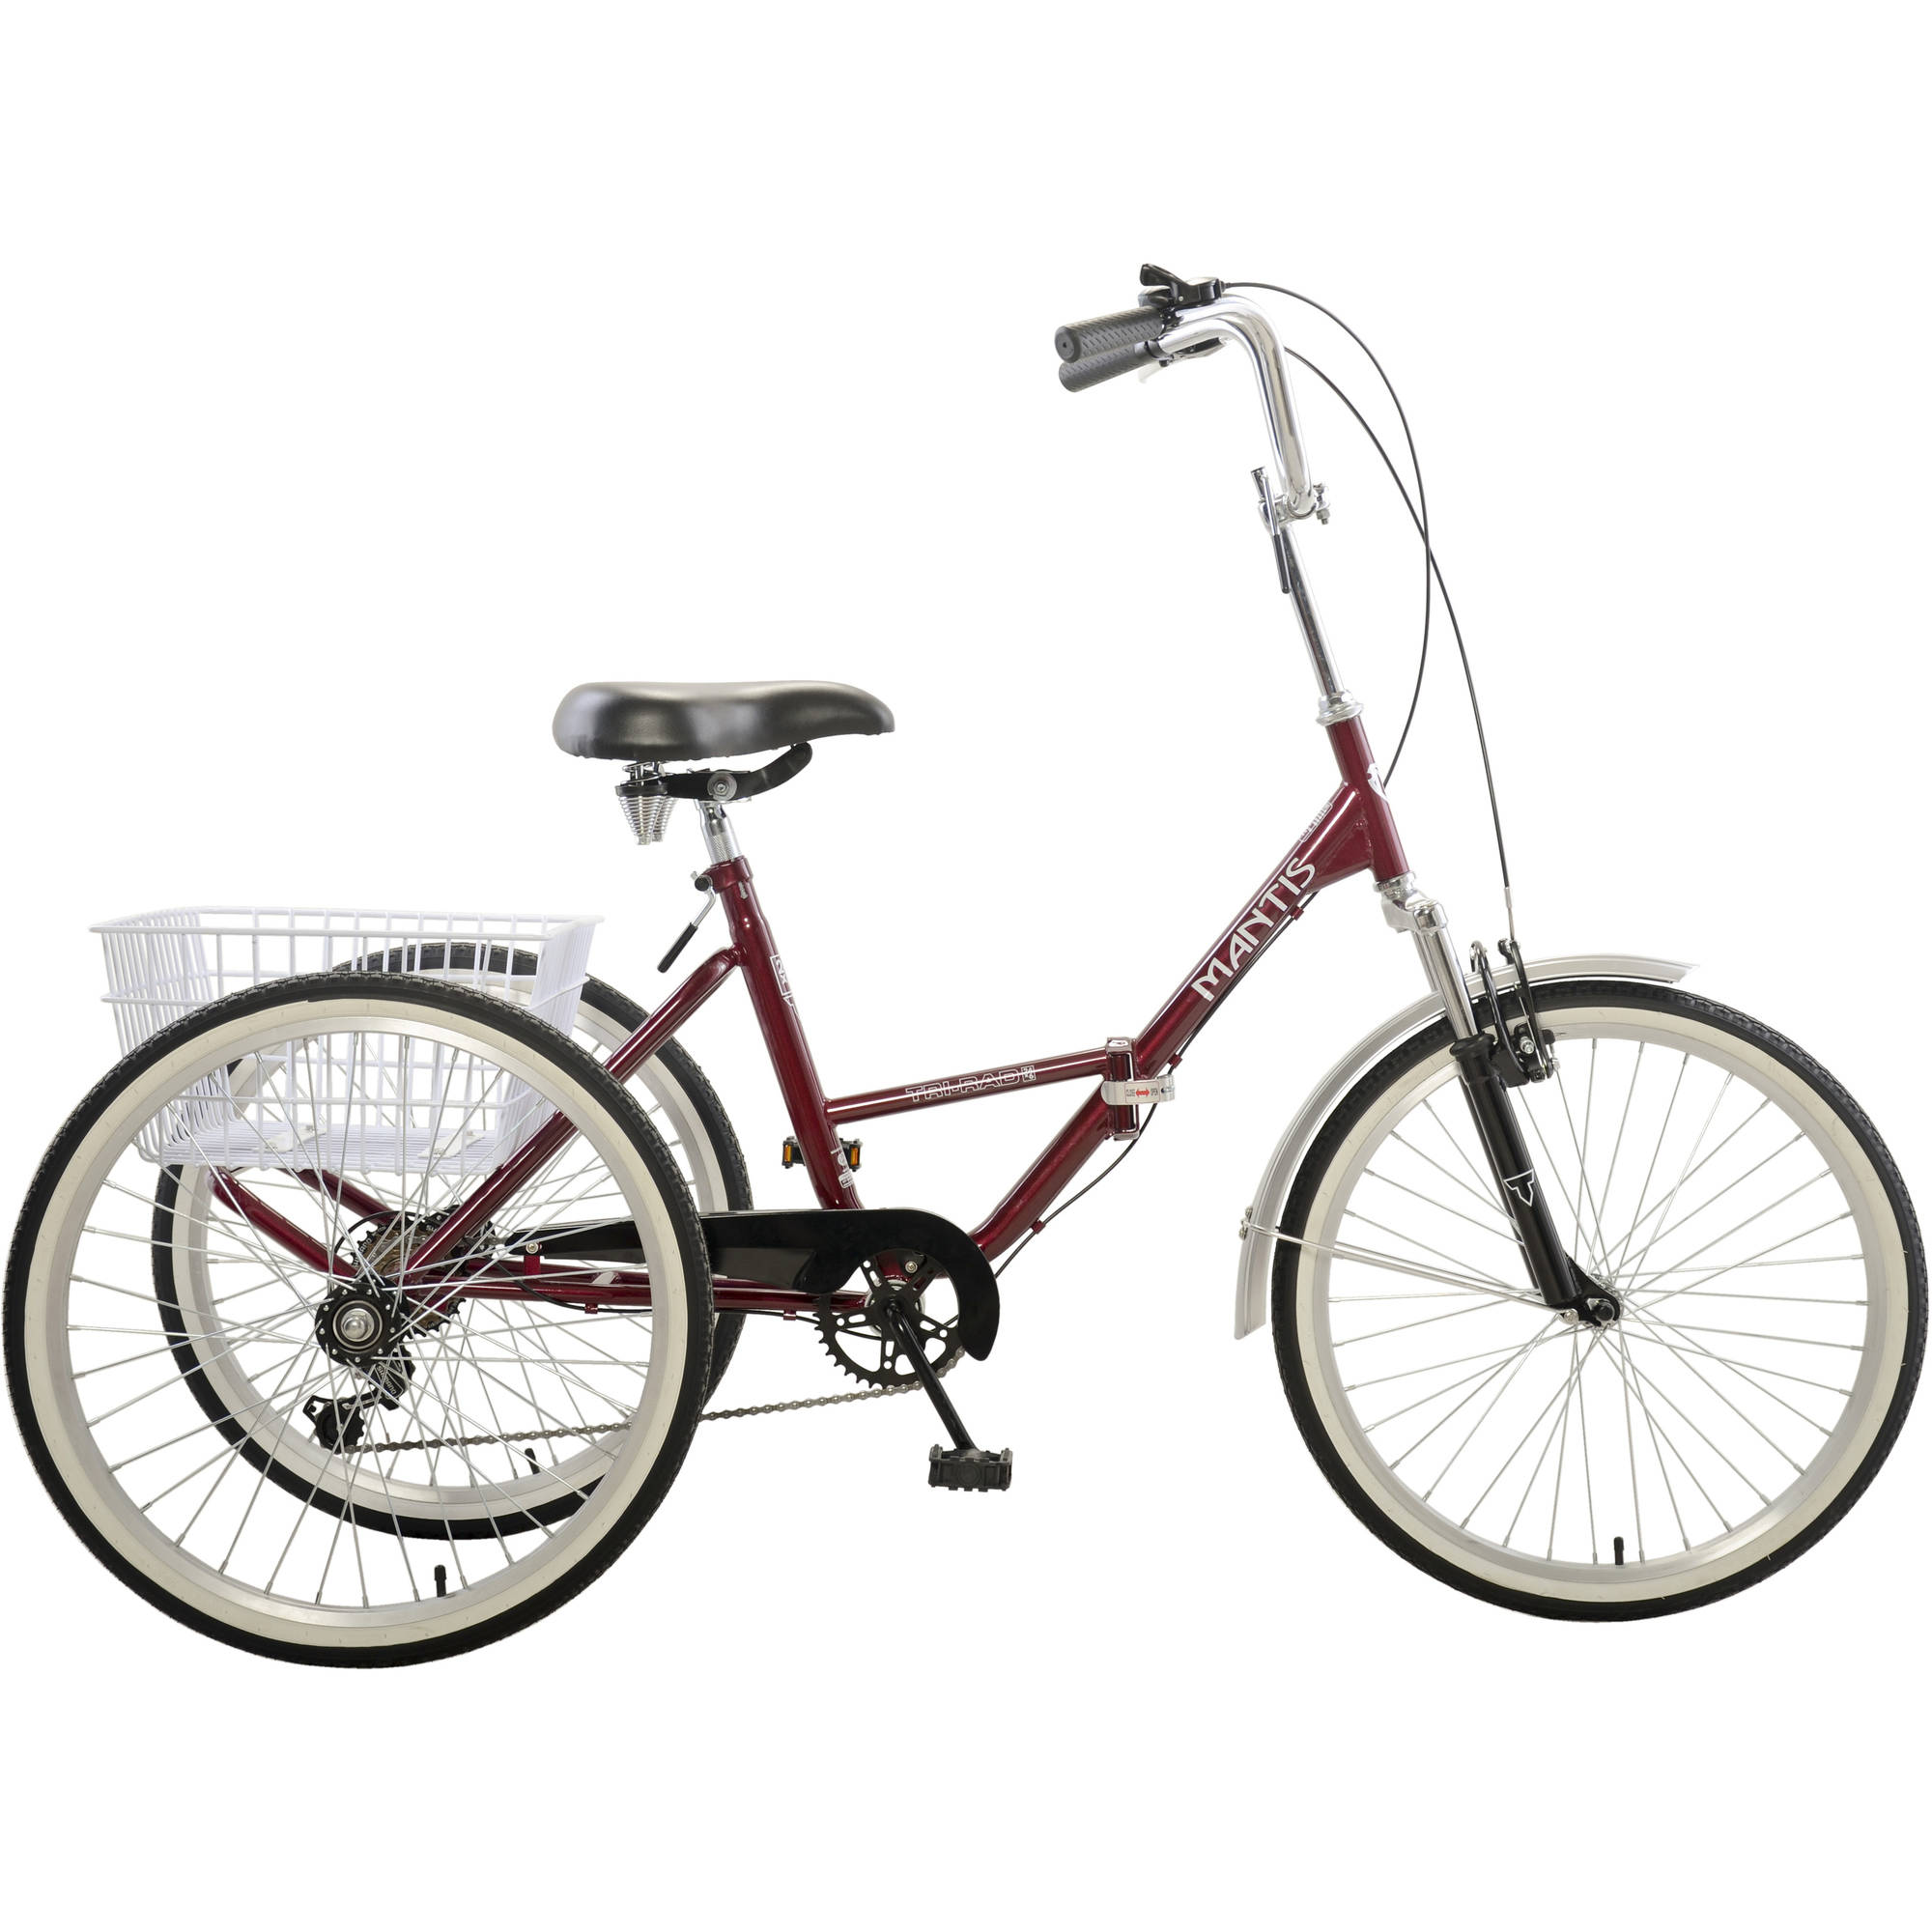 "Mantis Tri-Rad 6-Speed Adult Folding Tricycle, 24"" Wheels, Burgundy"